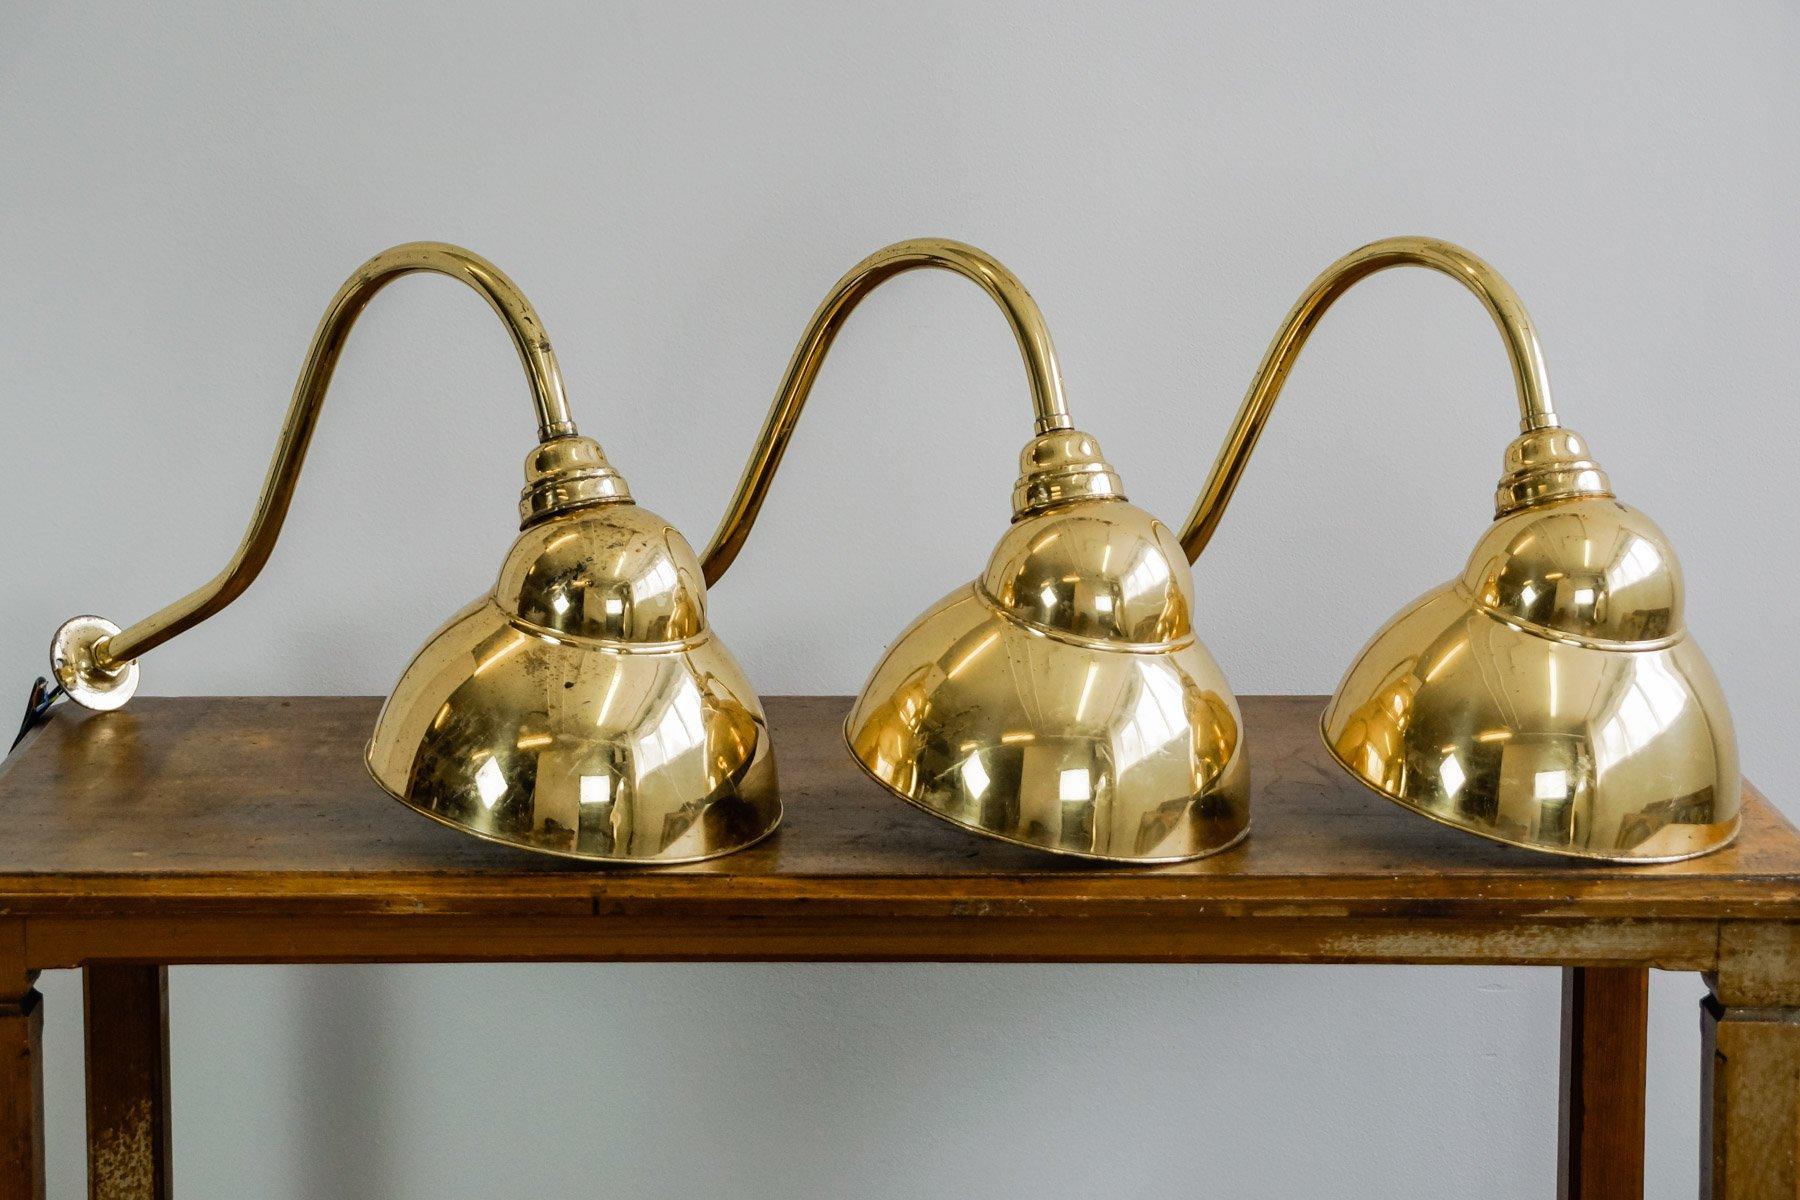 Vintage English Brass Spotlight Sconce, 1920s for sale at Pamono